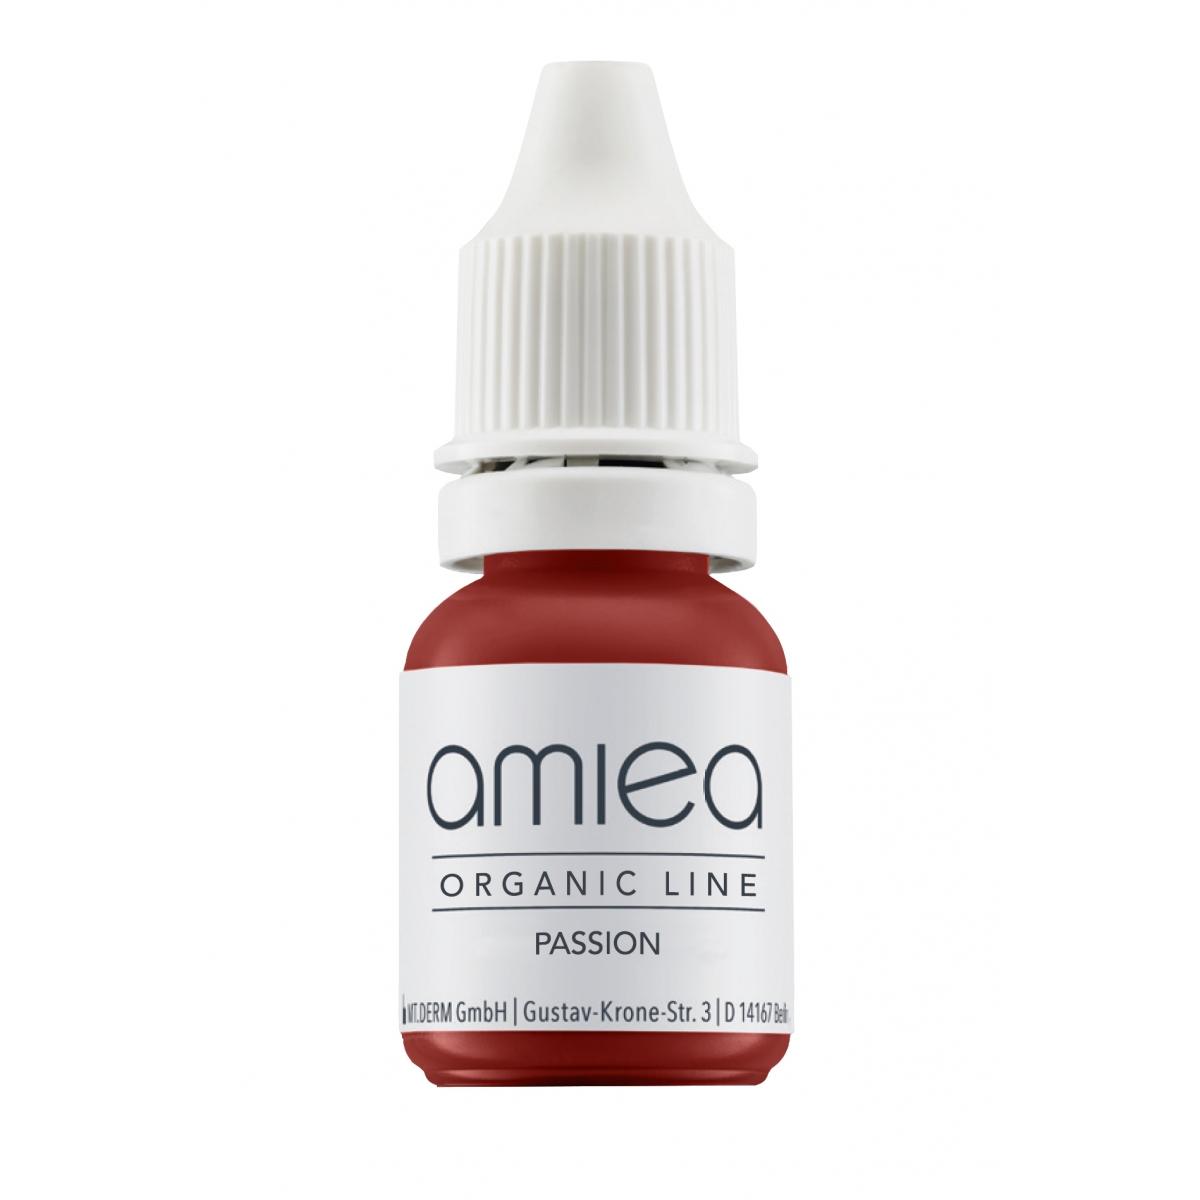 Organicline (10 ml) - PIGMENTS AMIEA ORGANICLINE PASSION, Flacon 10 ml